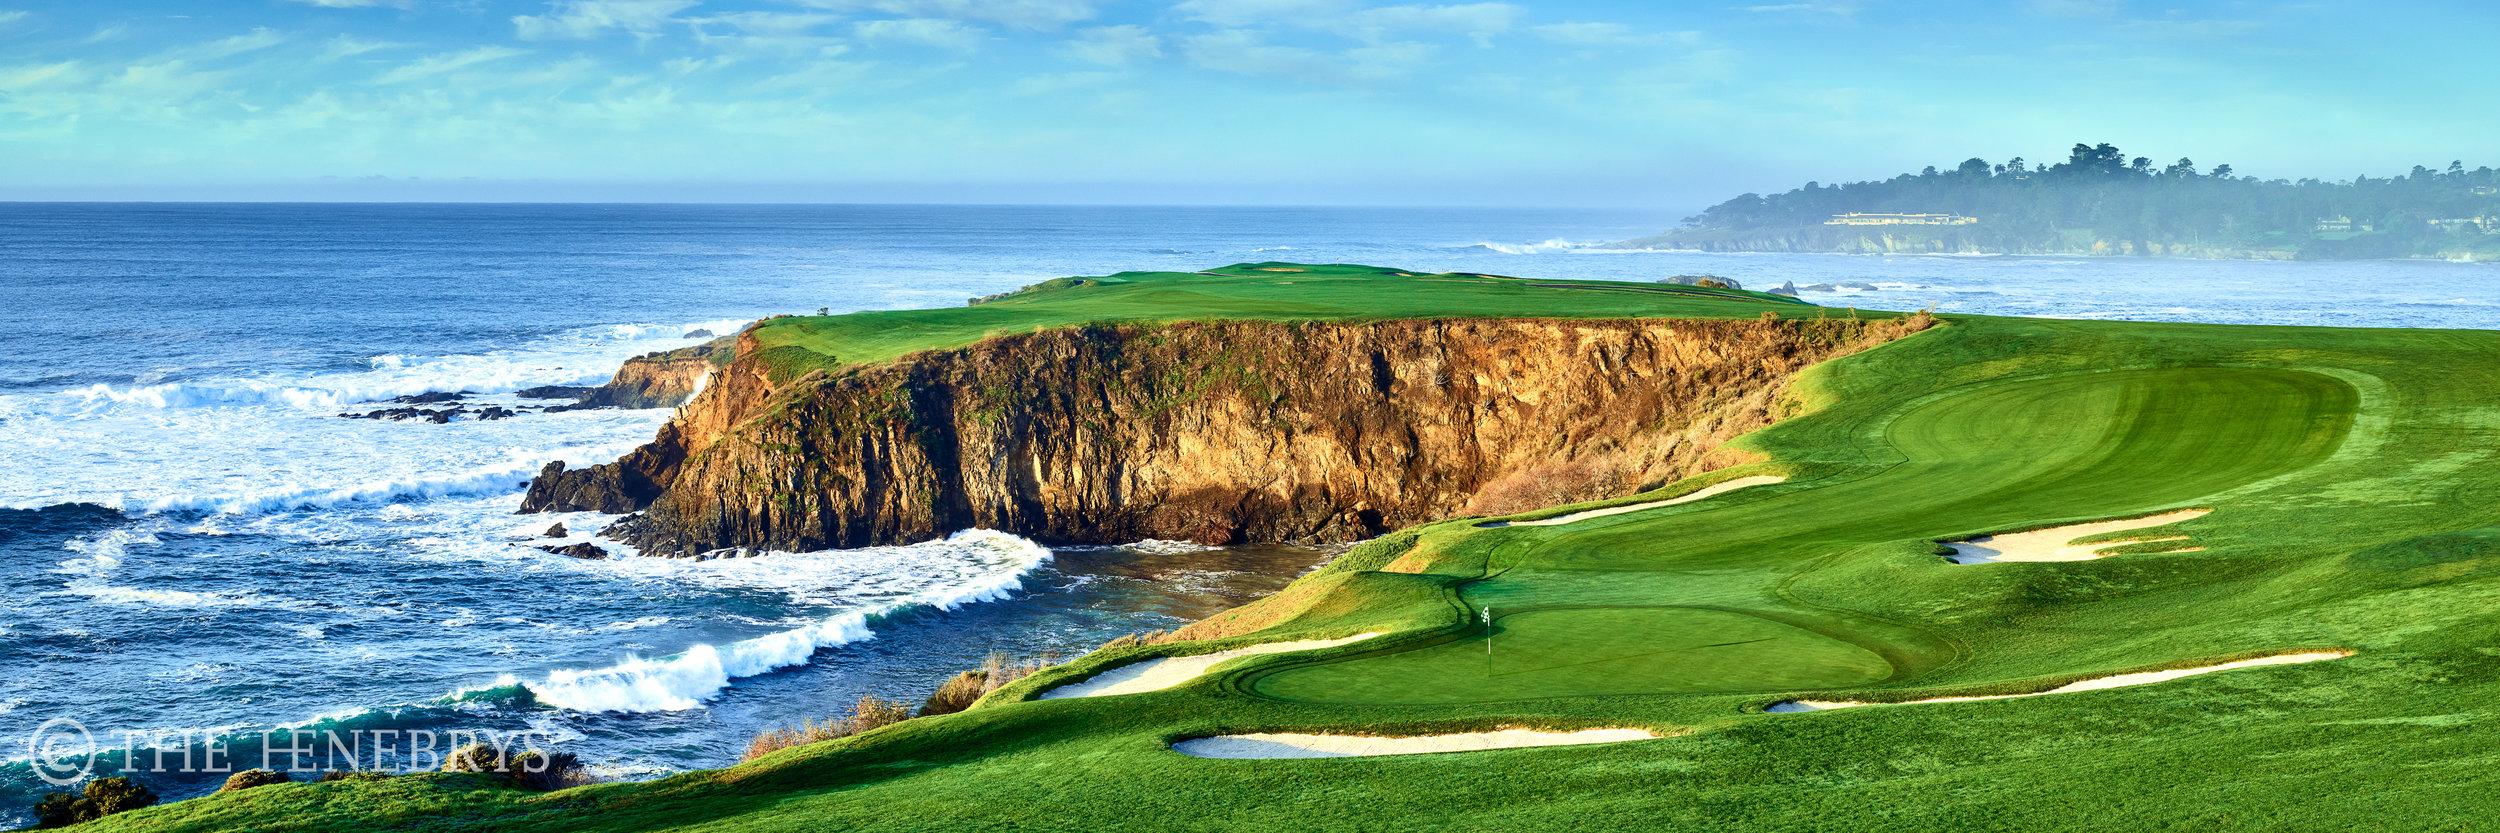 "Pebble Beach Golf Links® #08 ""Wonderous View"", Pebble Beach, California"